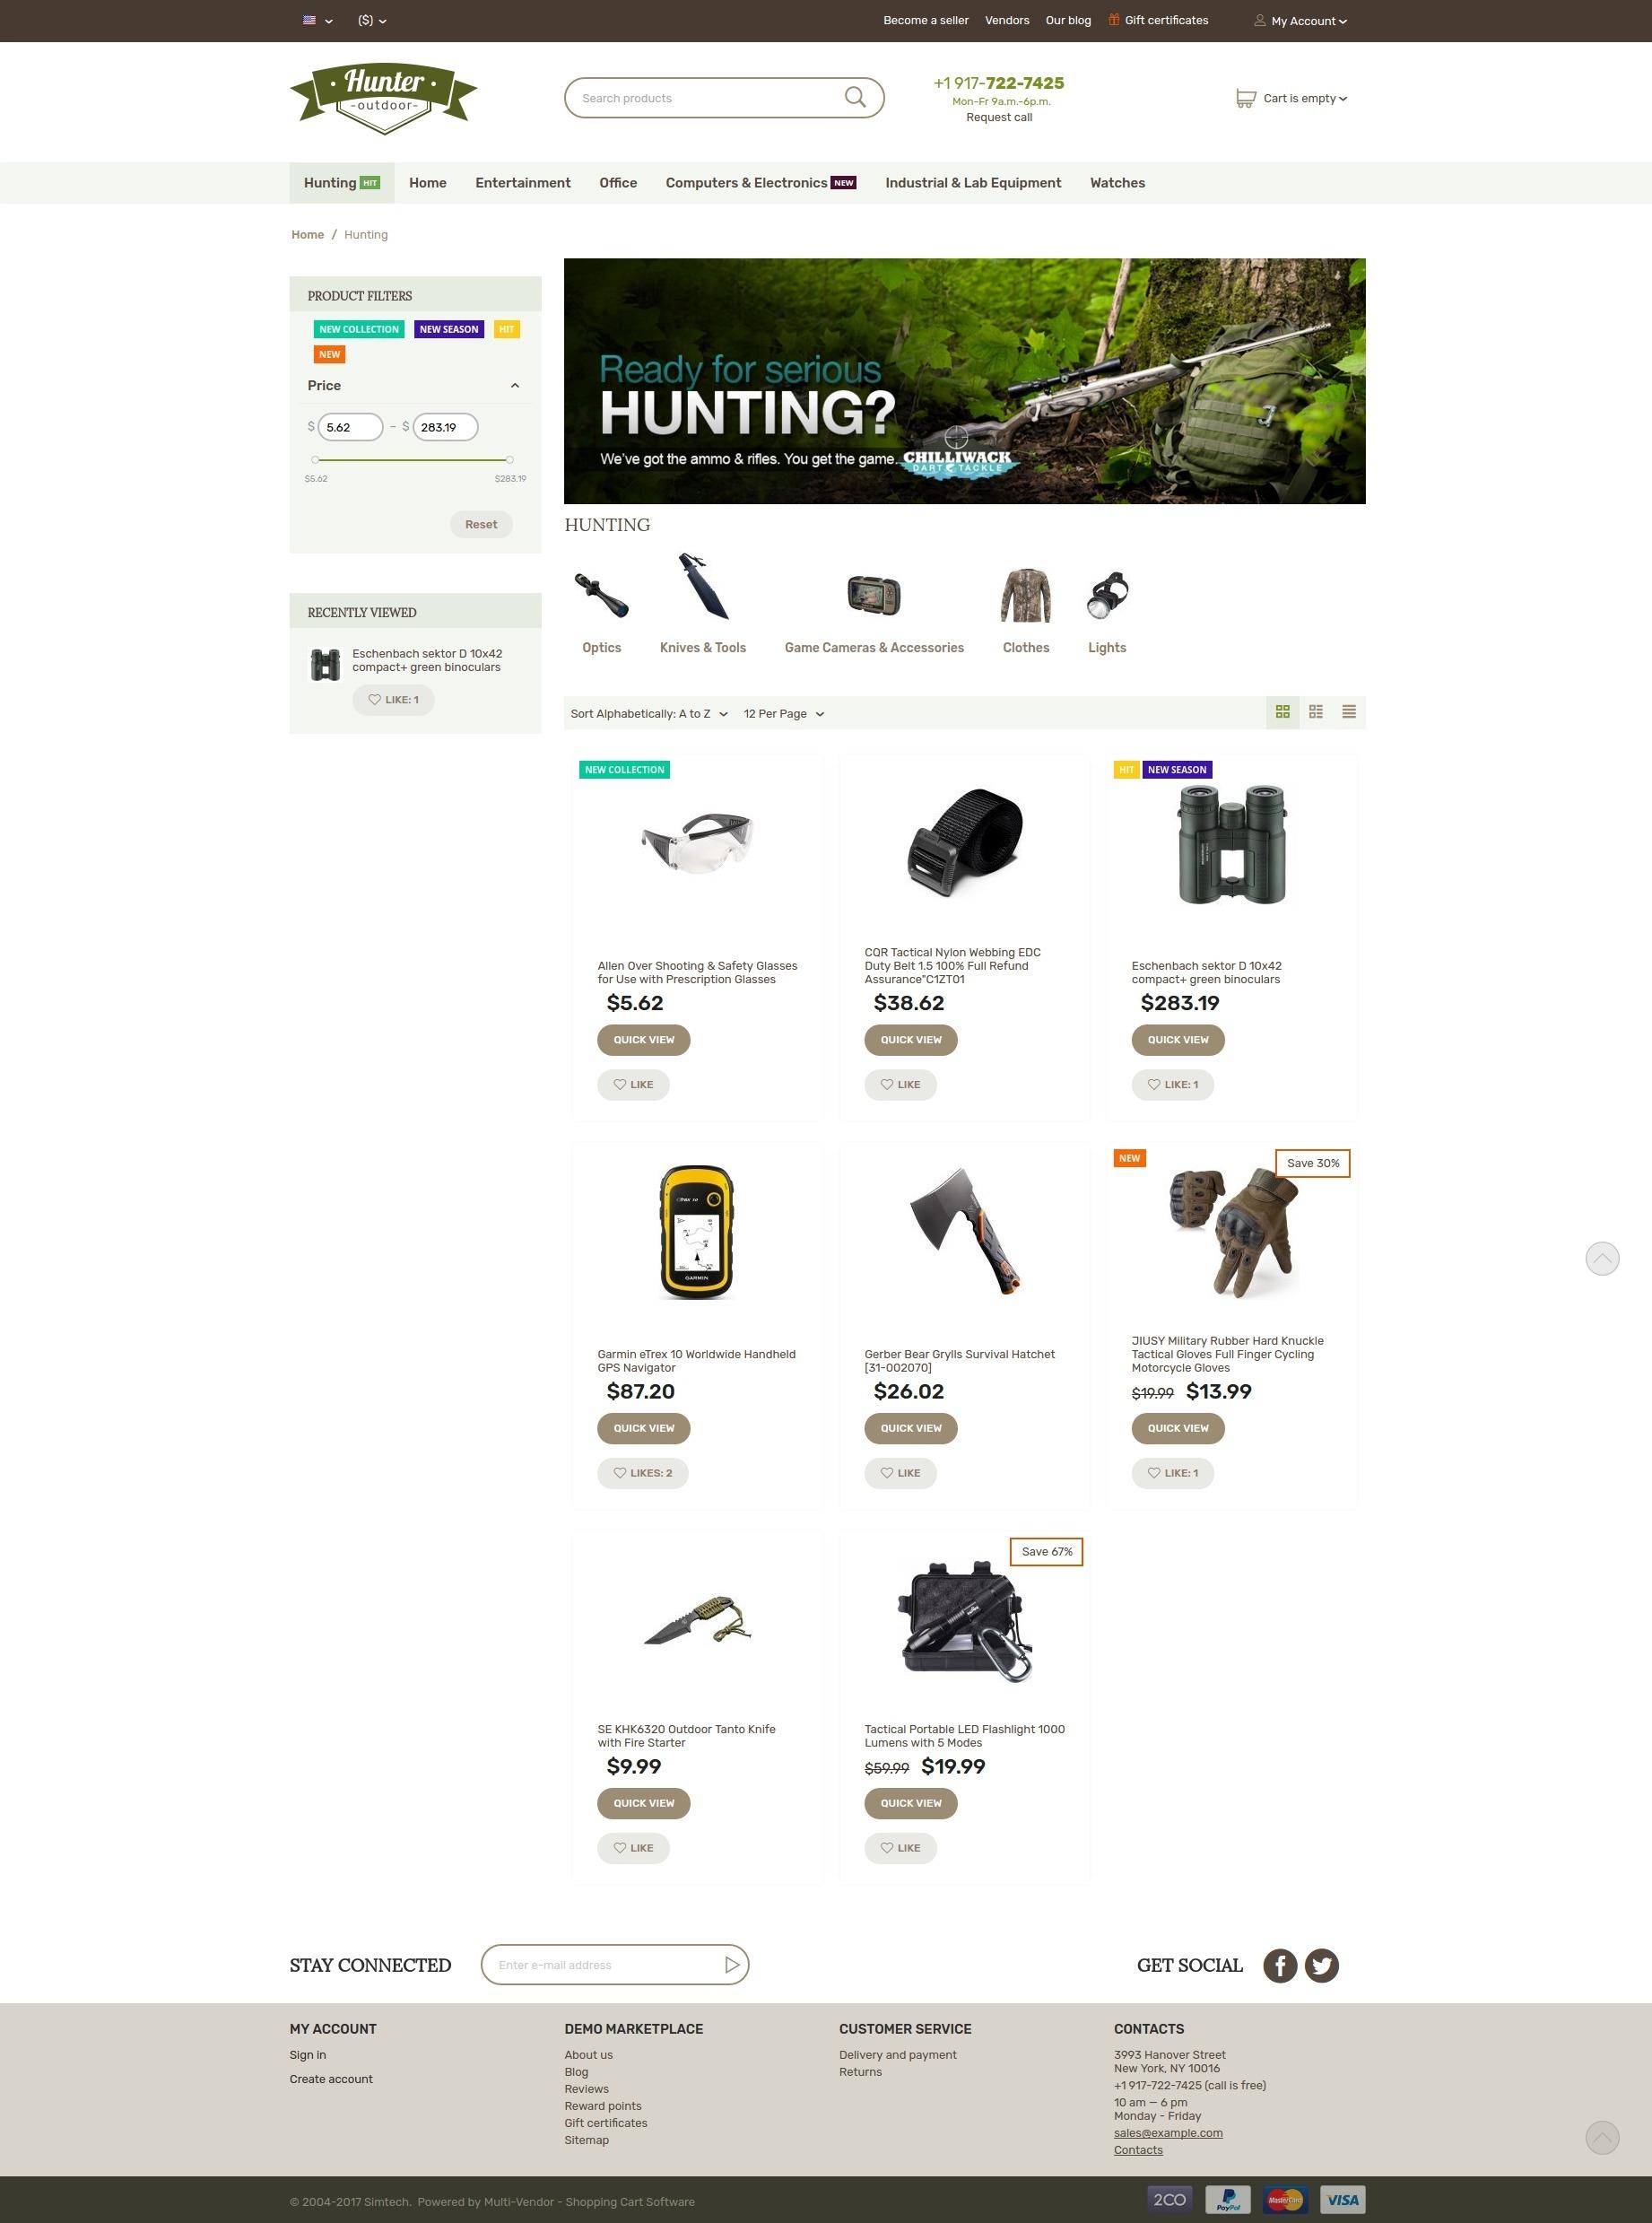 hunter-theme-catalog.jpg?1511973320485